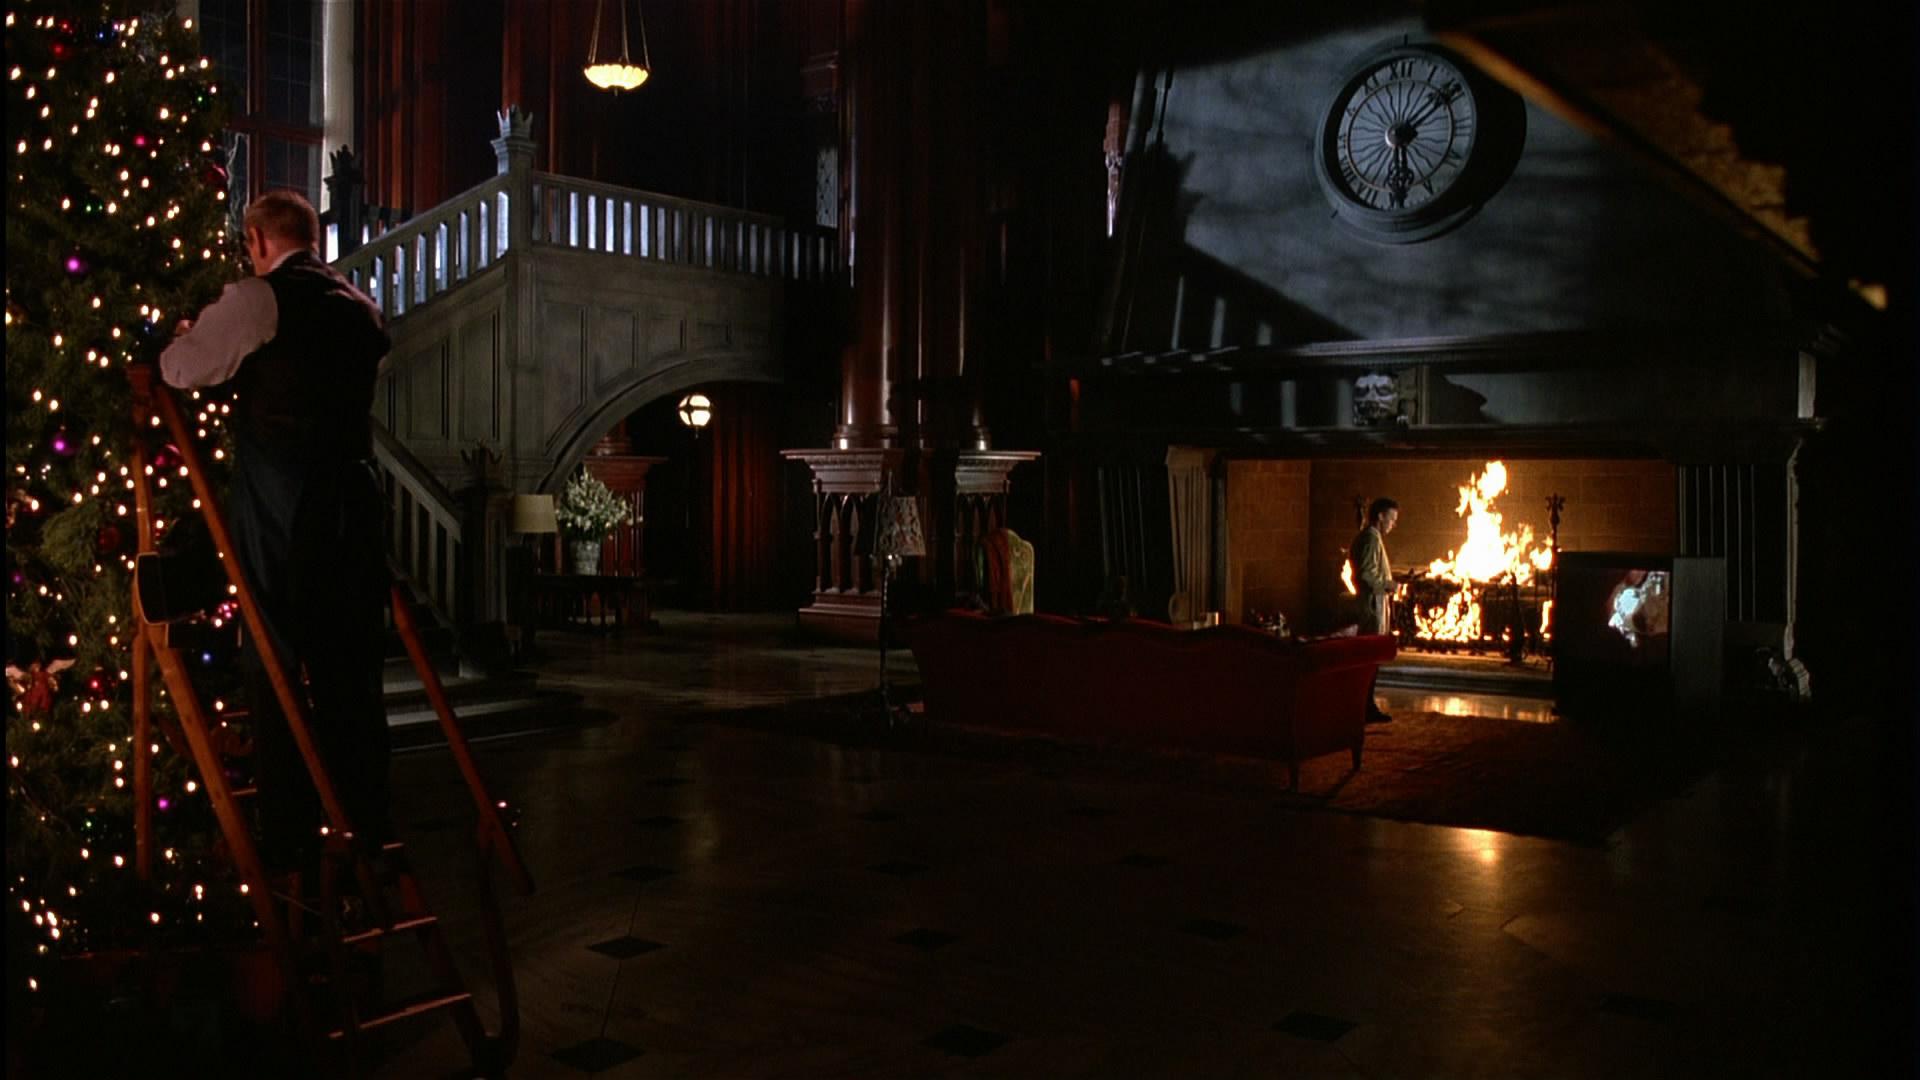 Harry Potter Themed Bedroom Batman Online Gallery Wayne Manor Interior From Batman